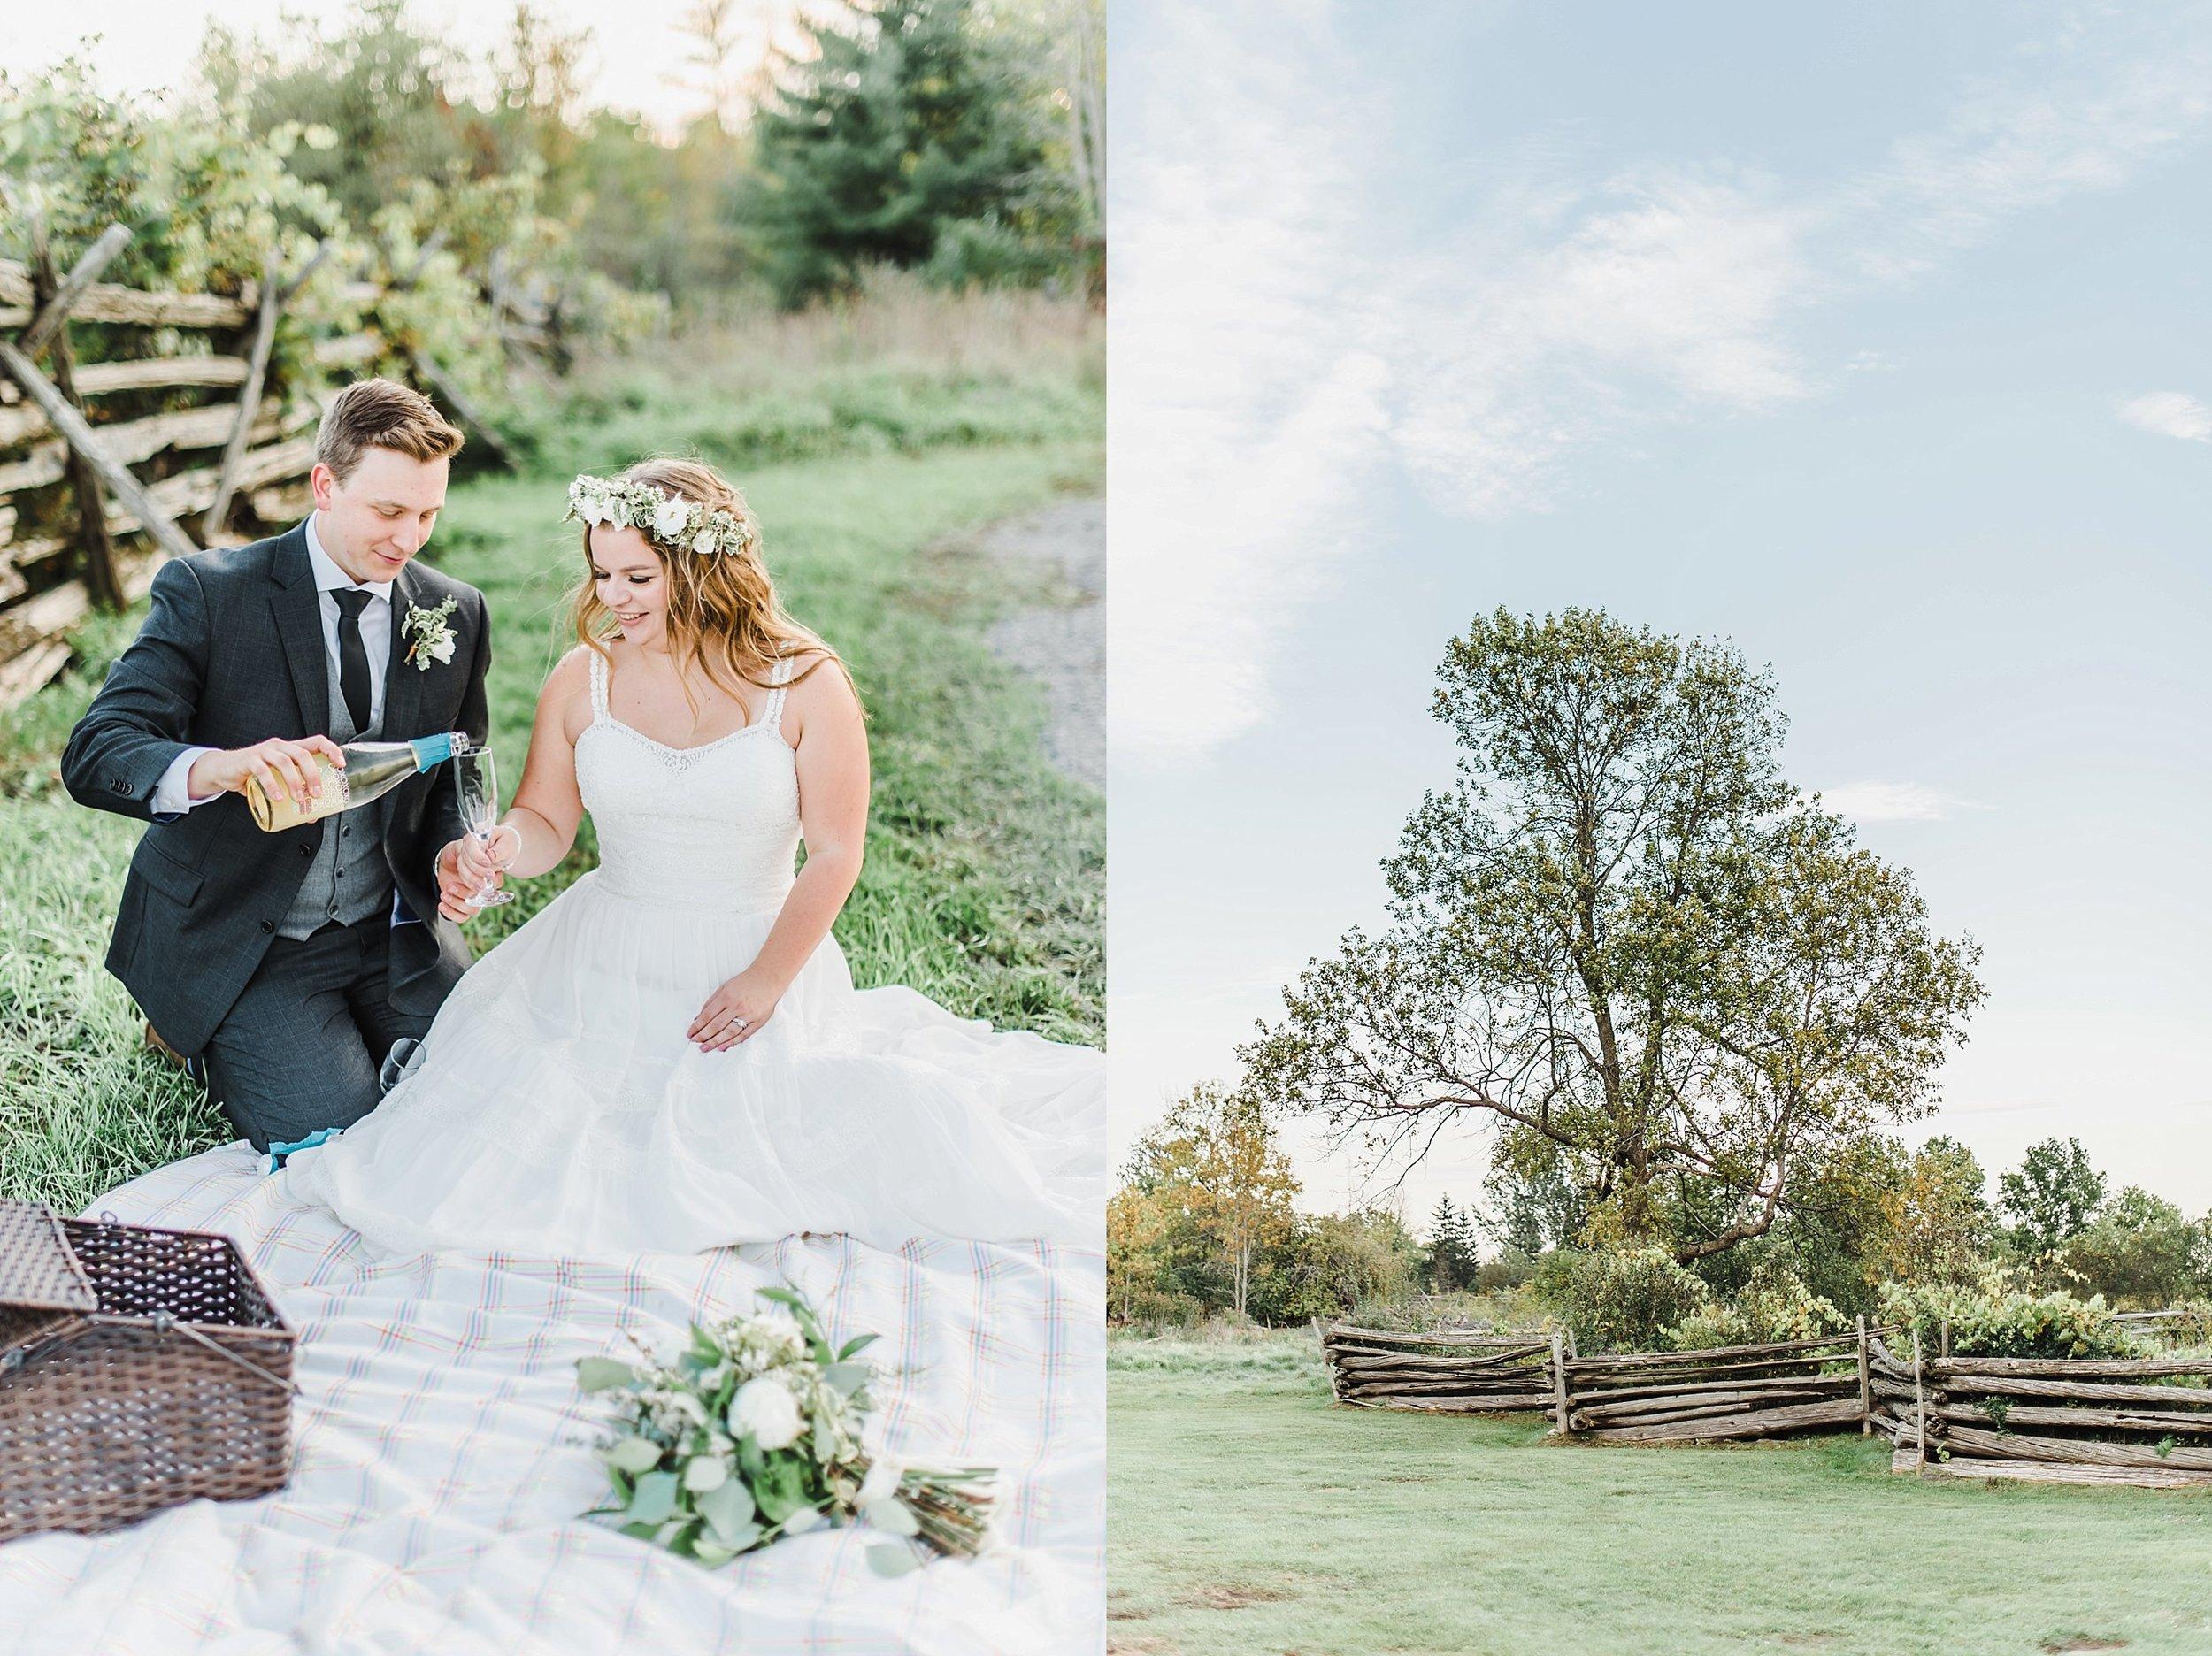 light airy indie fine art ottawa wedding photographer | Ali and Batoul Photography_1206.jpg